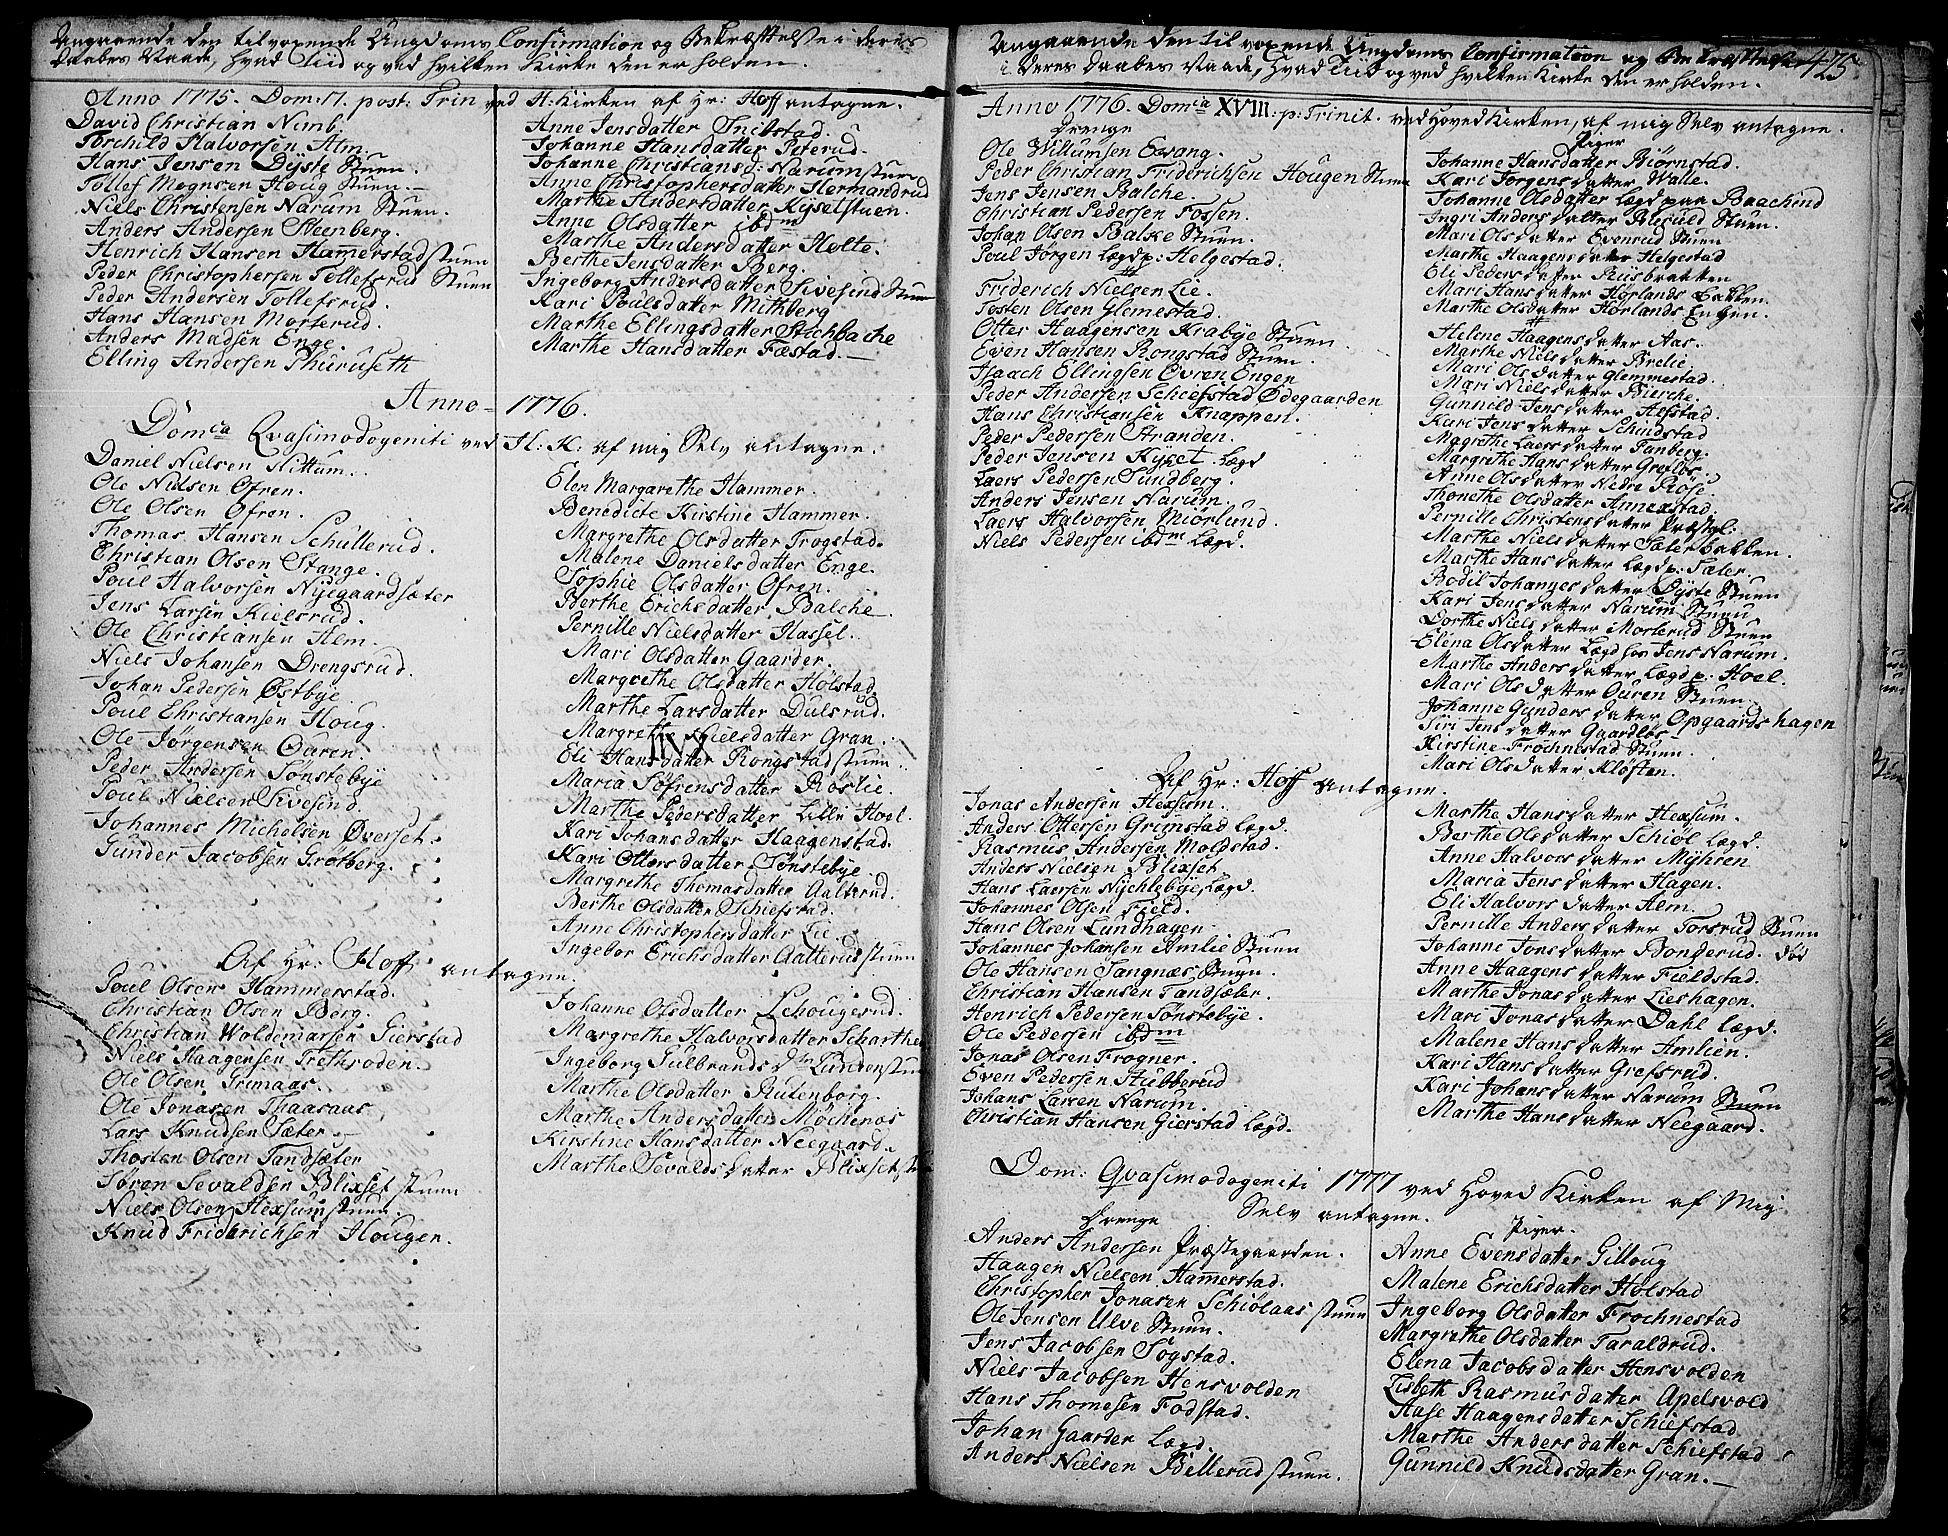 SAH, Toten prestekontor, Ministerialbok nr. 6, 1773-1793, s. 425